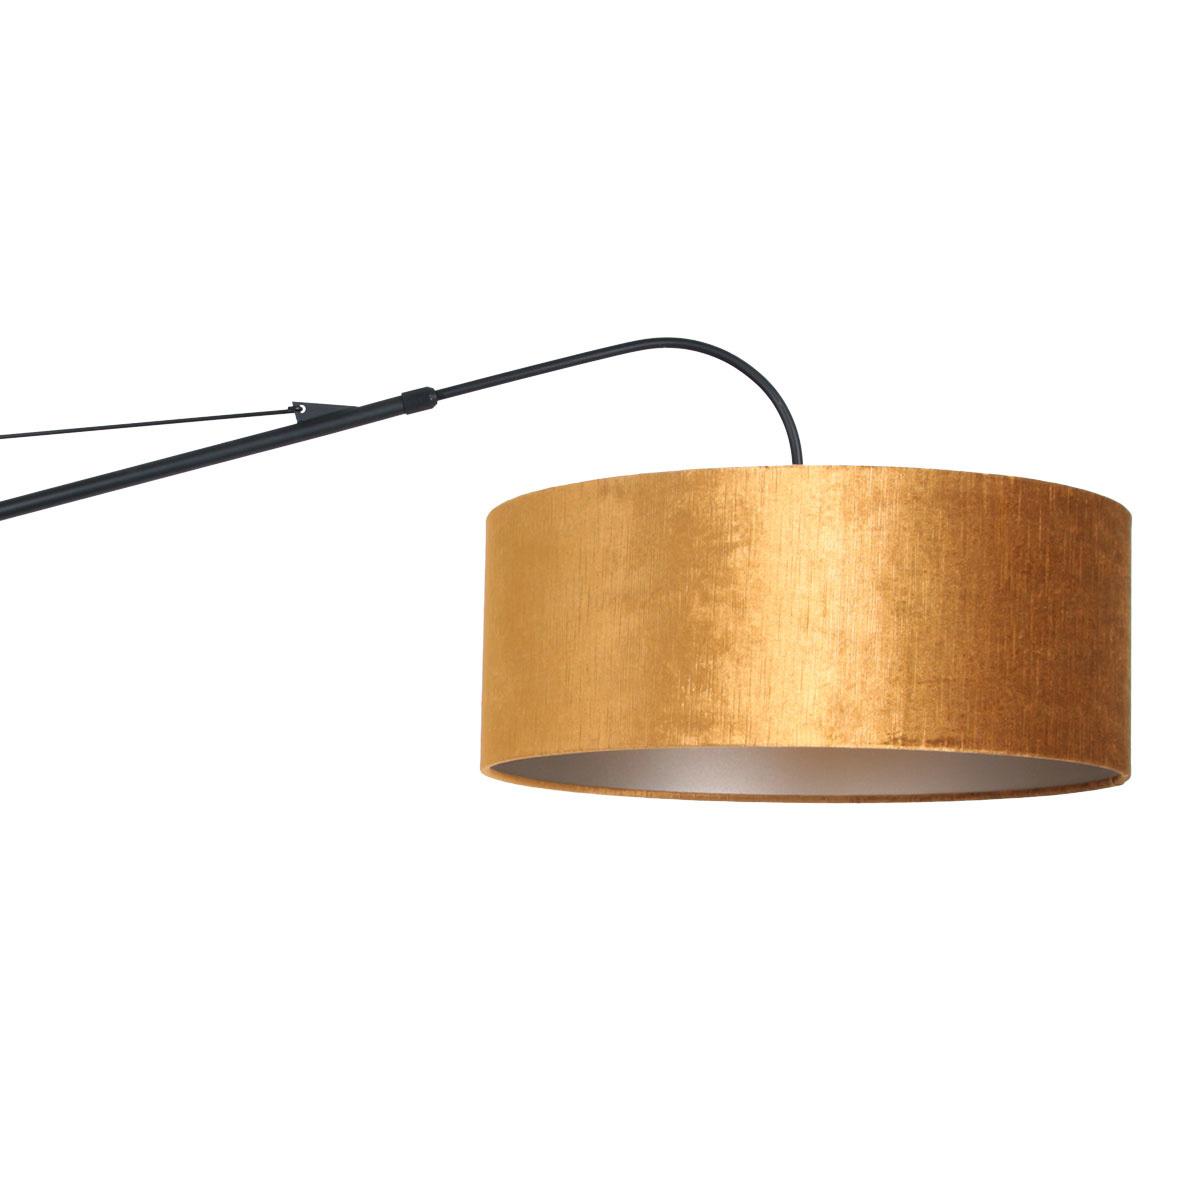 Steinhauer Wandlamp elegant classy 8135 zwart velours kap goud